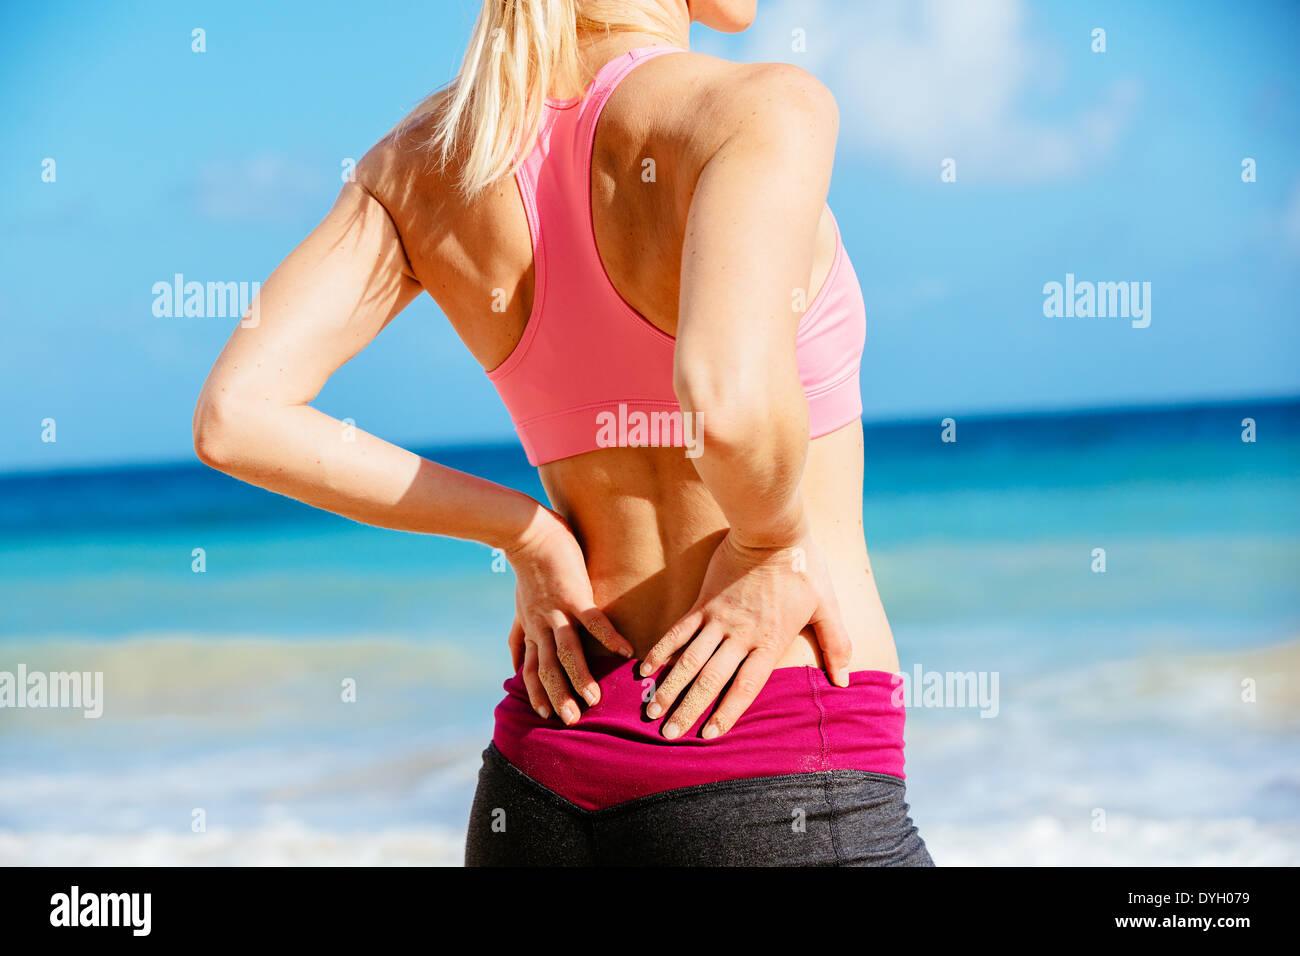 Back Muscles Muscular Woman Imágenes De Stock & Back Muscles ...